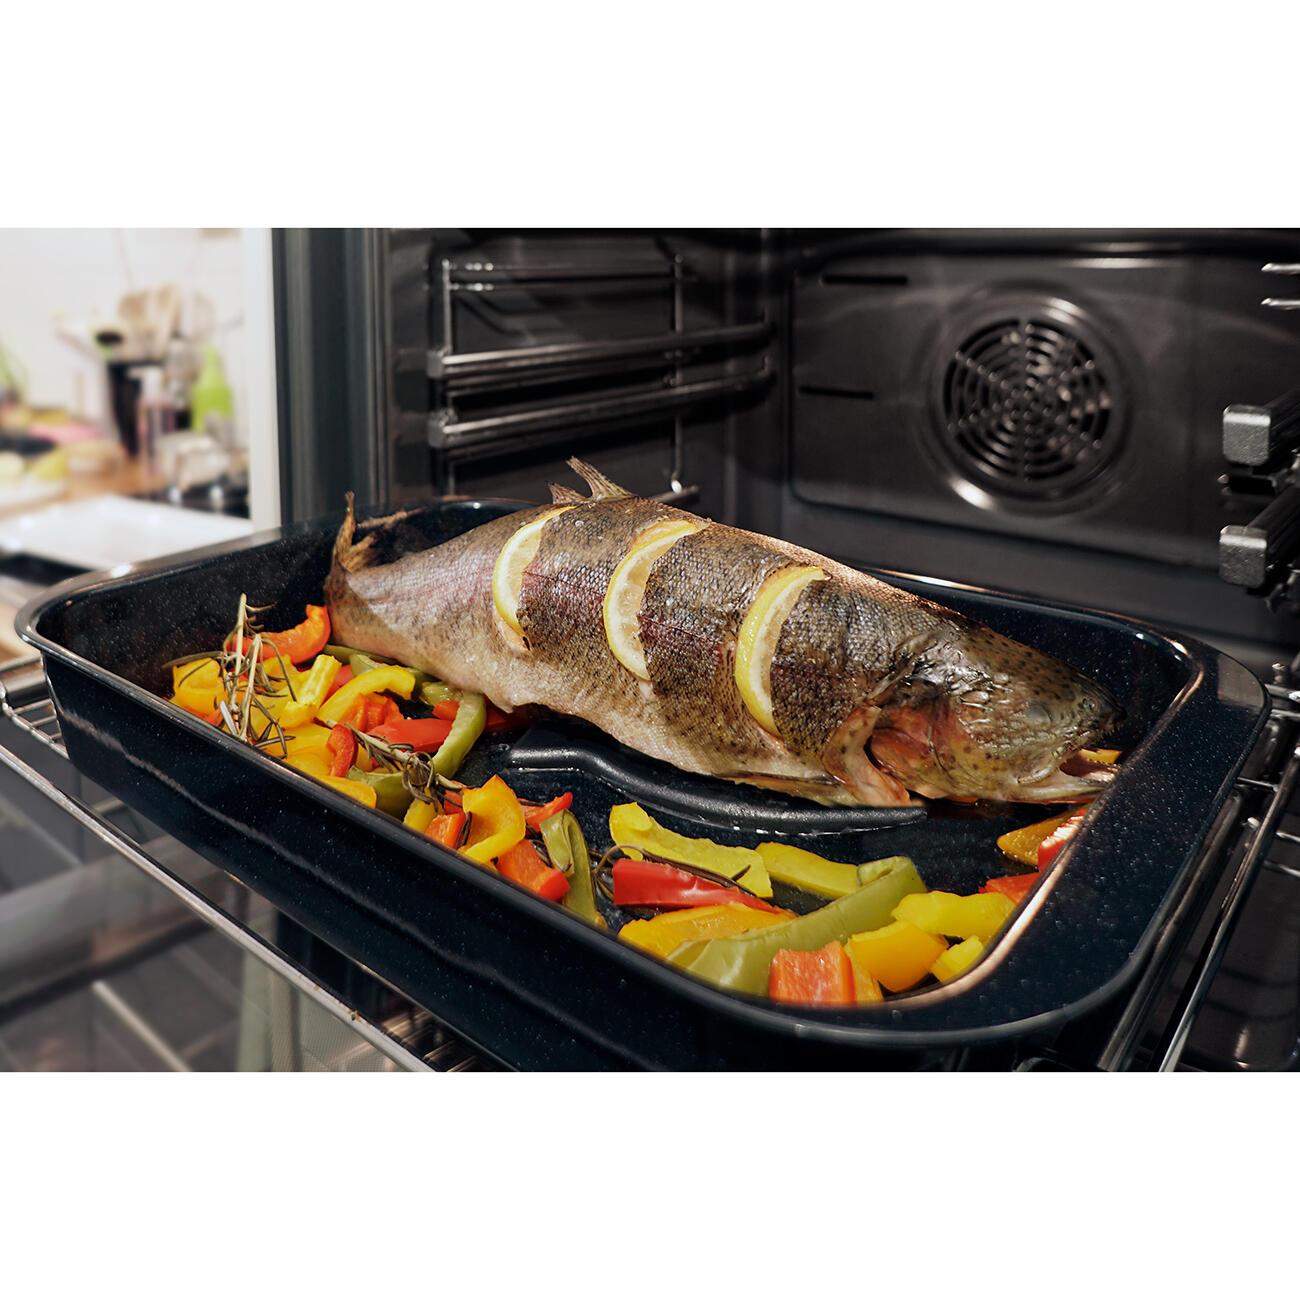 x barbecue pour que le poisson ne colle pas